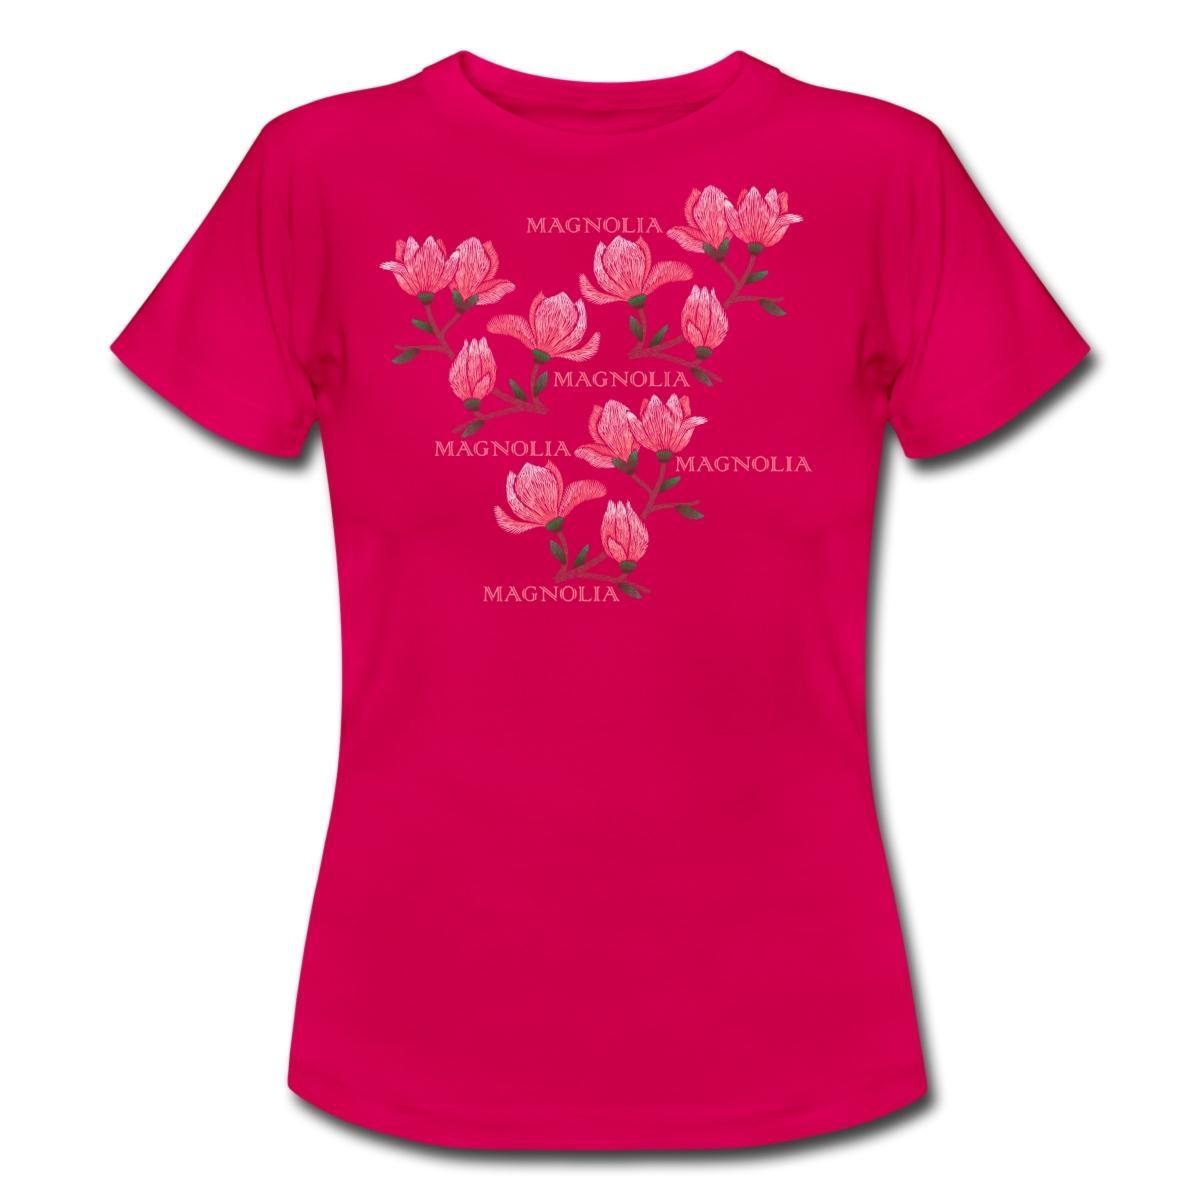 magnolia-t-shirt-dam-c.jpg